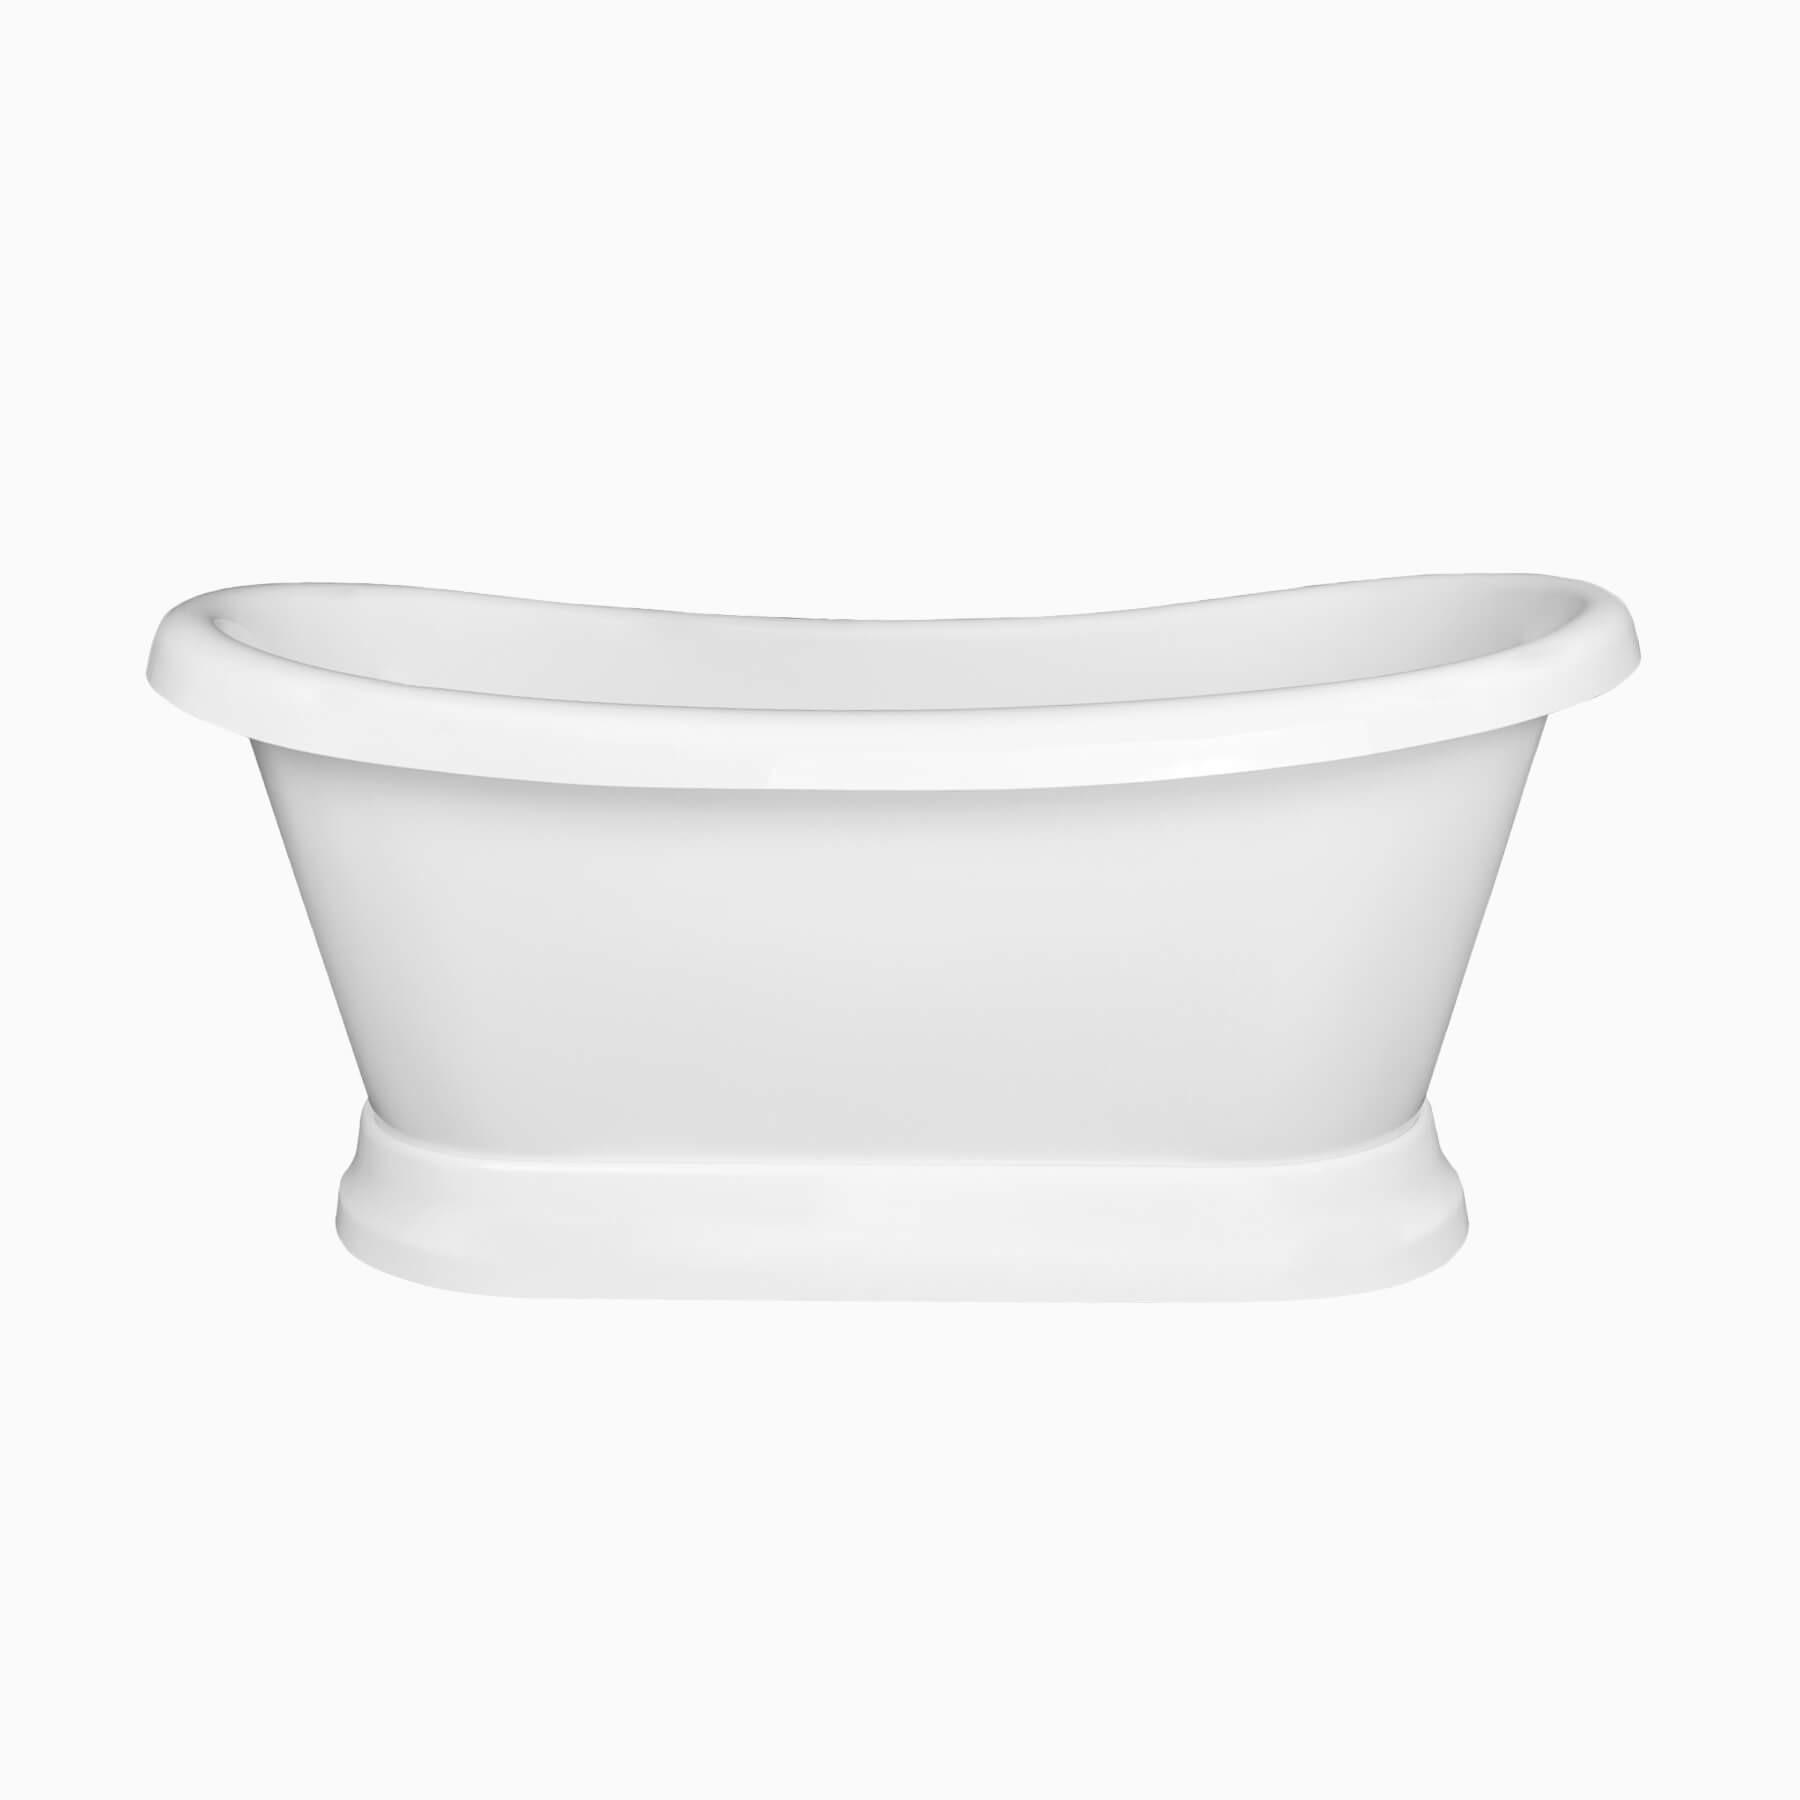 Bathtubs   Soaking Tubs For Sale   Deep Soaker Bath Tub